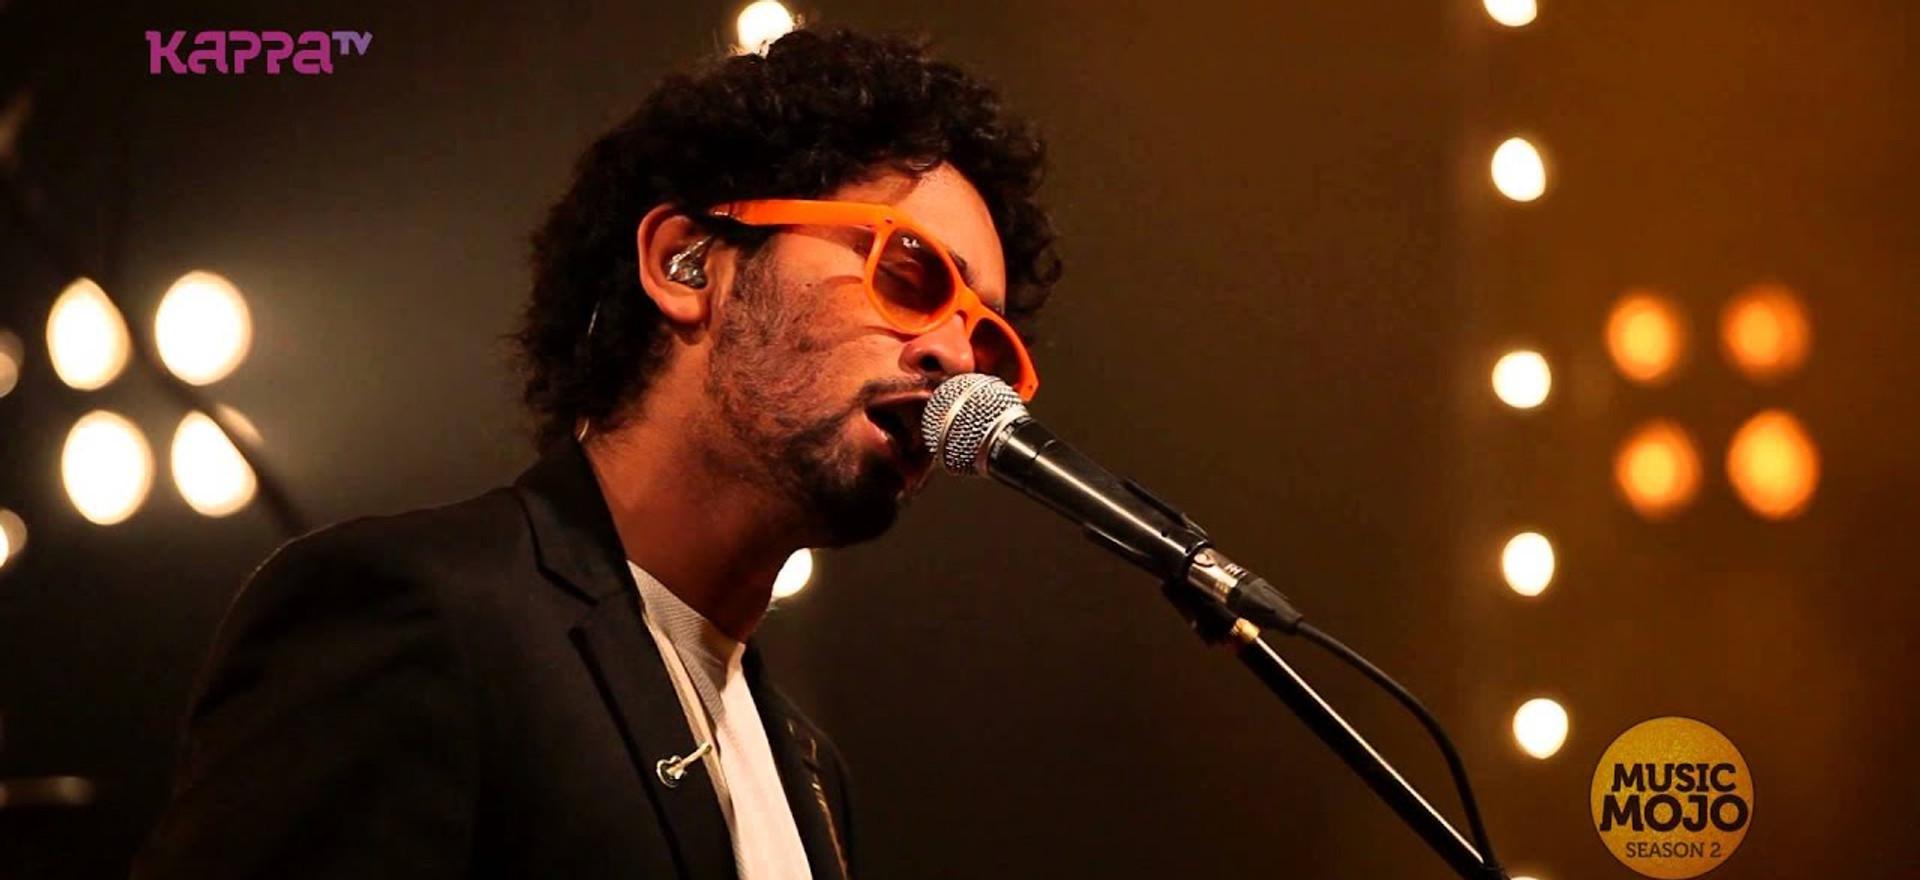 Shaking My Ground - Mad Orange Fireworks - Music Mojo Season 2 - Kappa TV